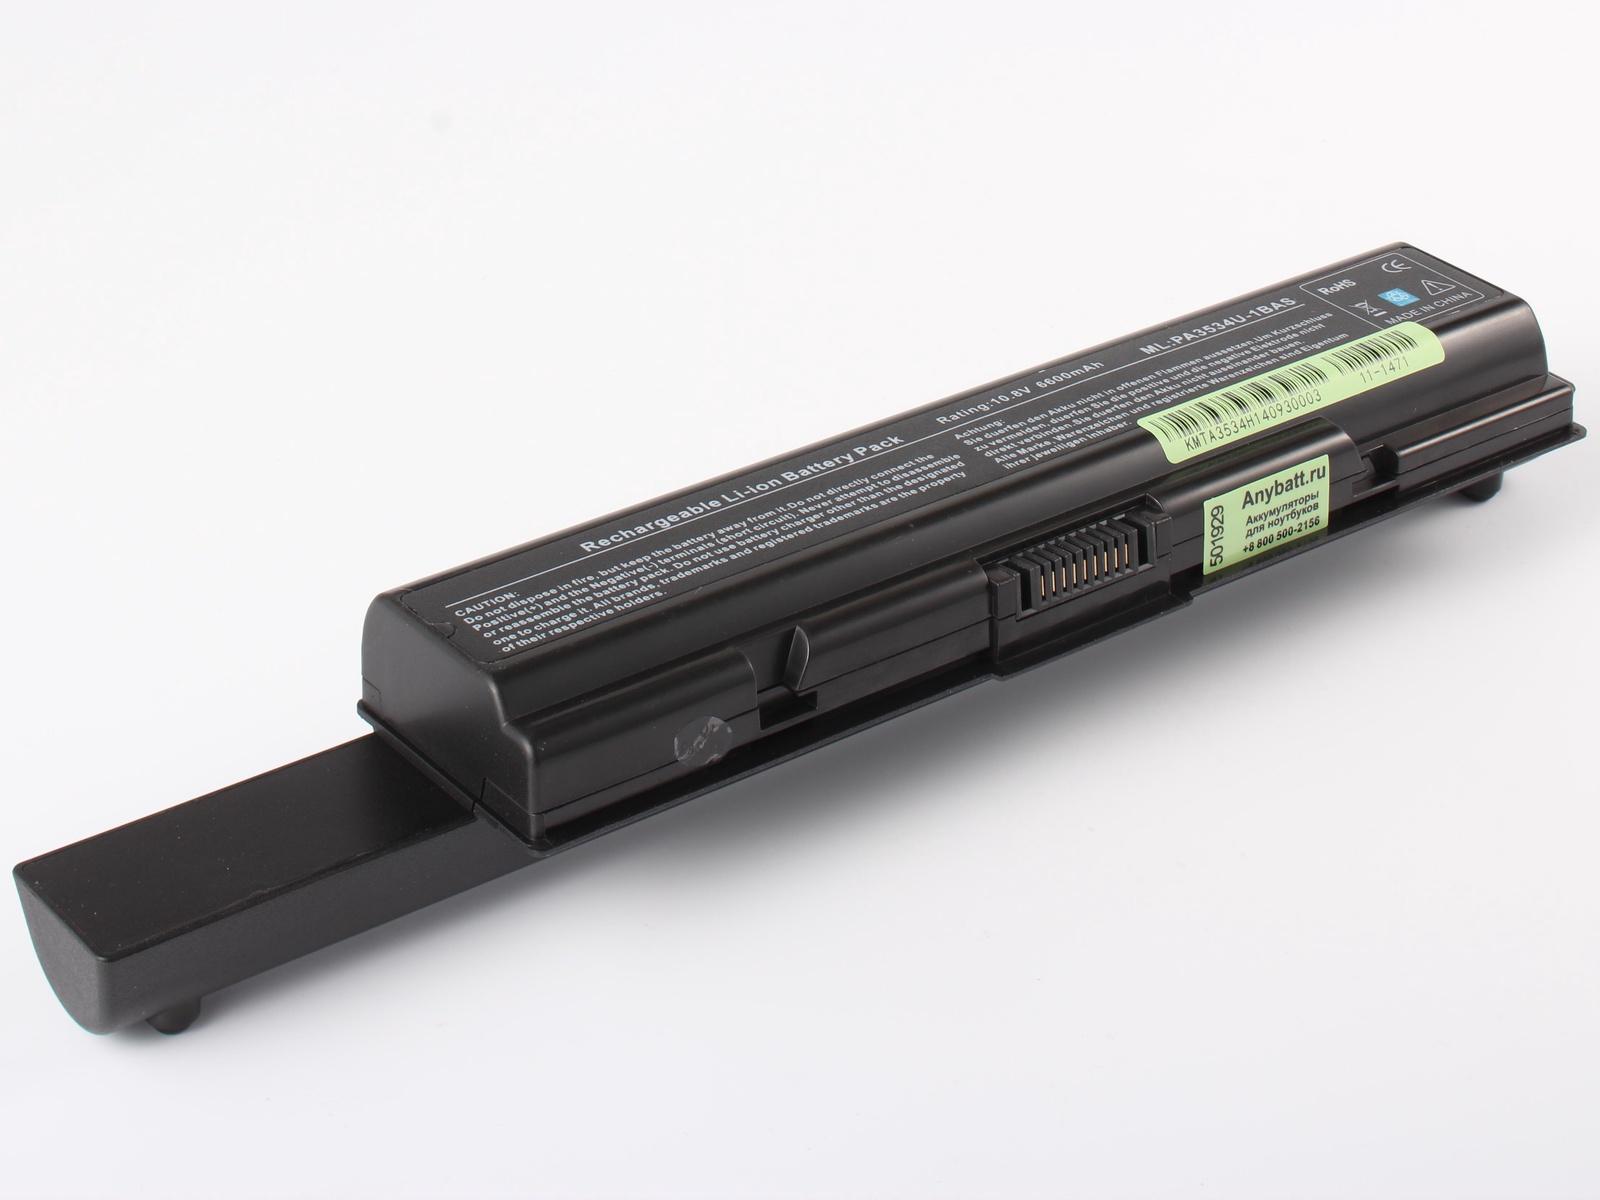 Аккумулятор для ноутбука AnyBatt для ToshiBa Satellite A300-22X, Satellite A205-S4707, Satellite A305-S6905, Satellite A350-22J, Satellite A350D-200, Satellite L450-18P, Satellite A300-1G2, Satellite L300D-245, Satellite A200-1S5